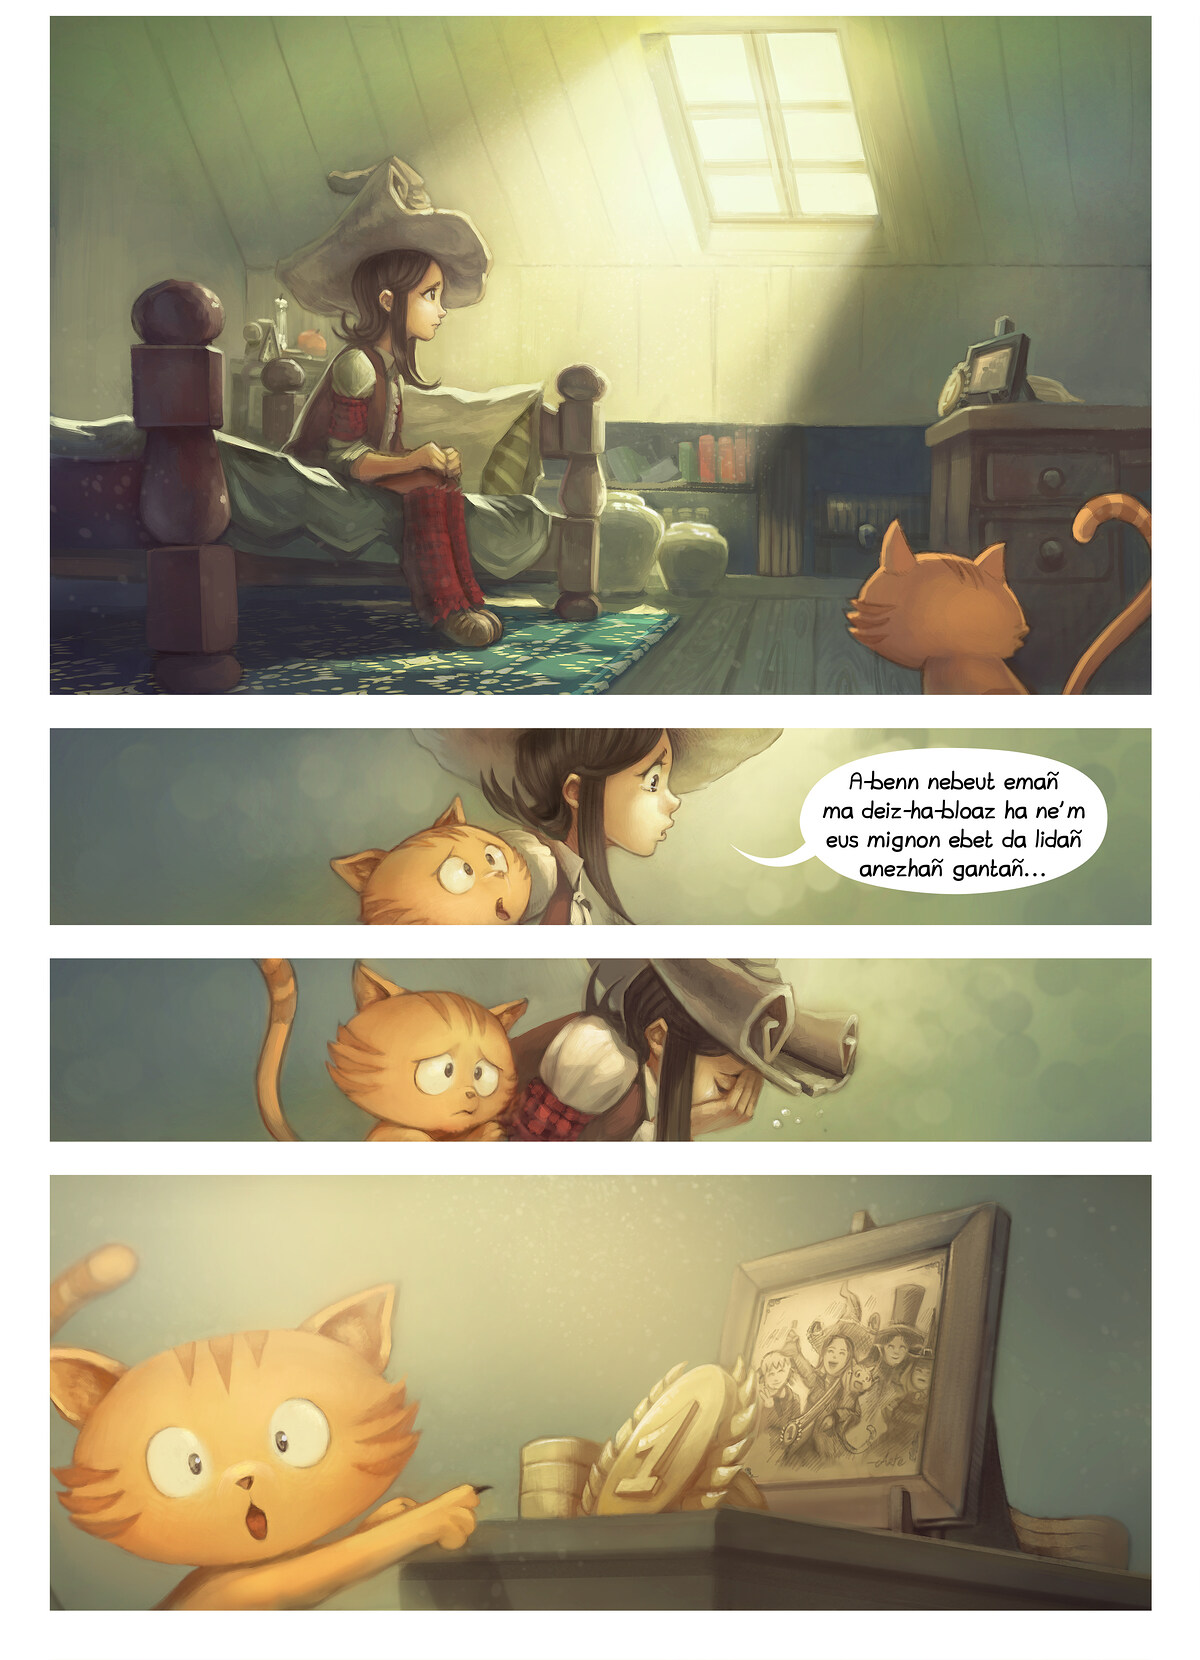 A webcomic page of Pepper&Carrot, rann 8 [br], pajenn 1